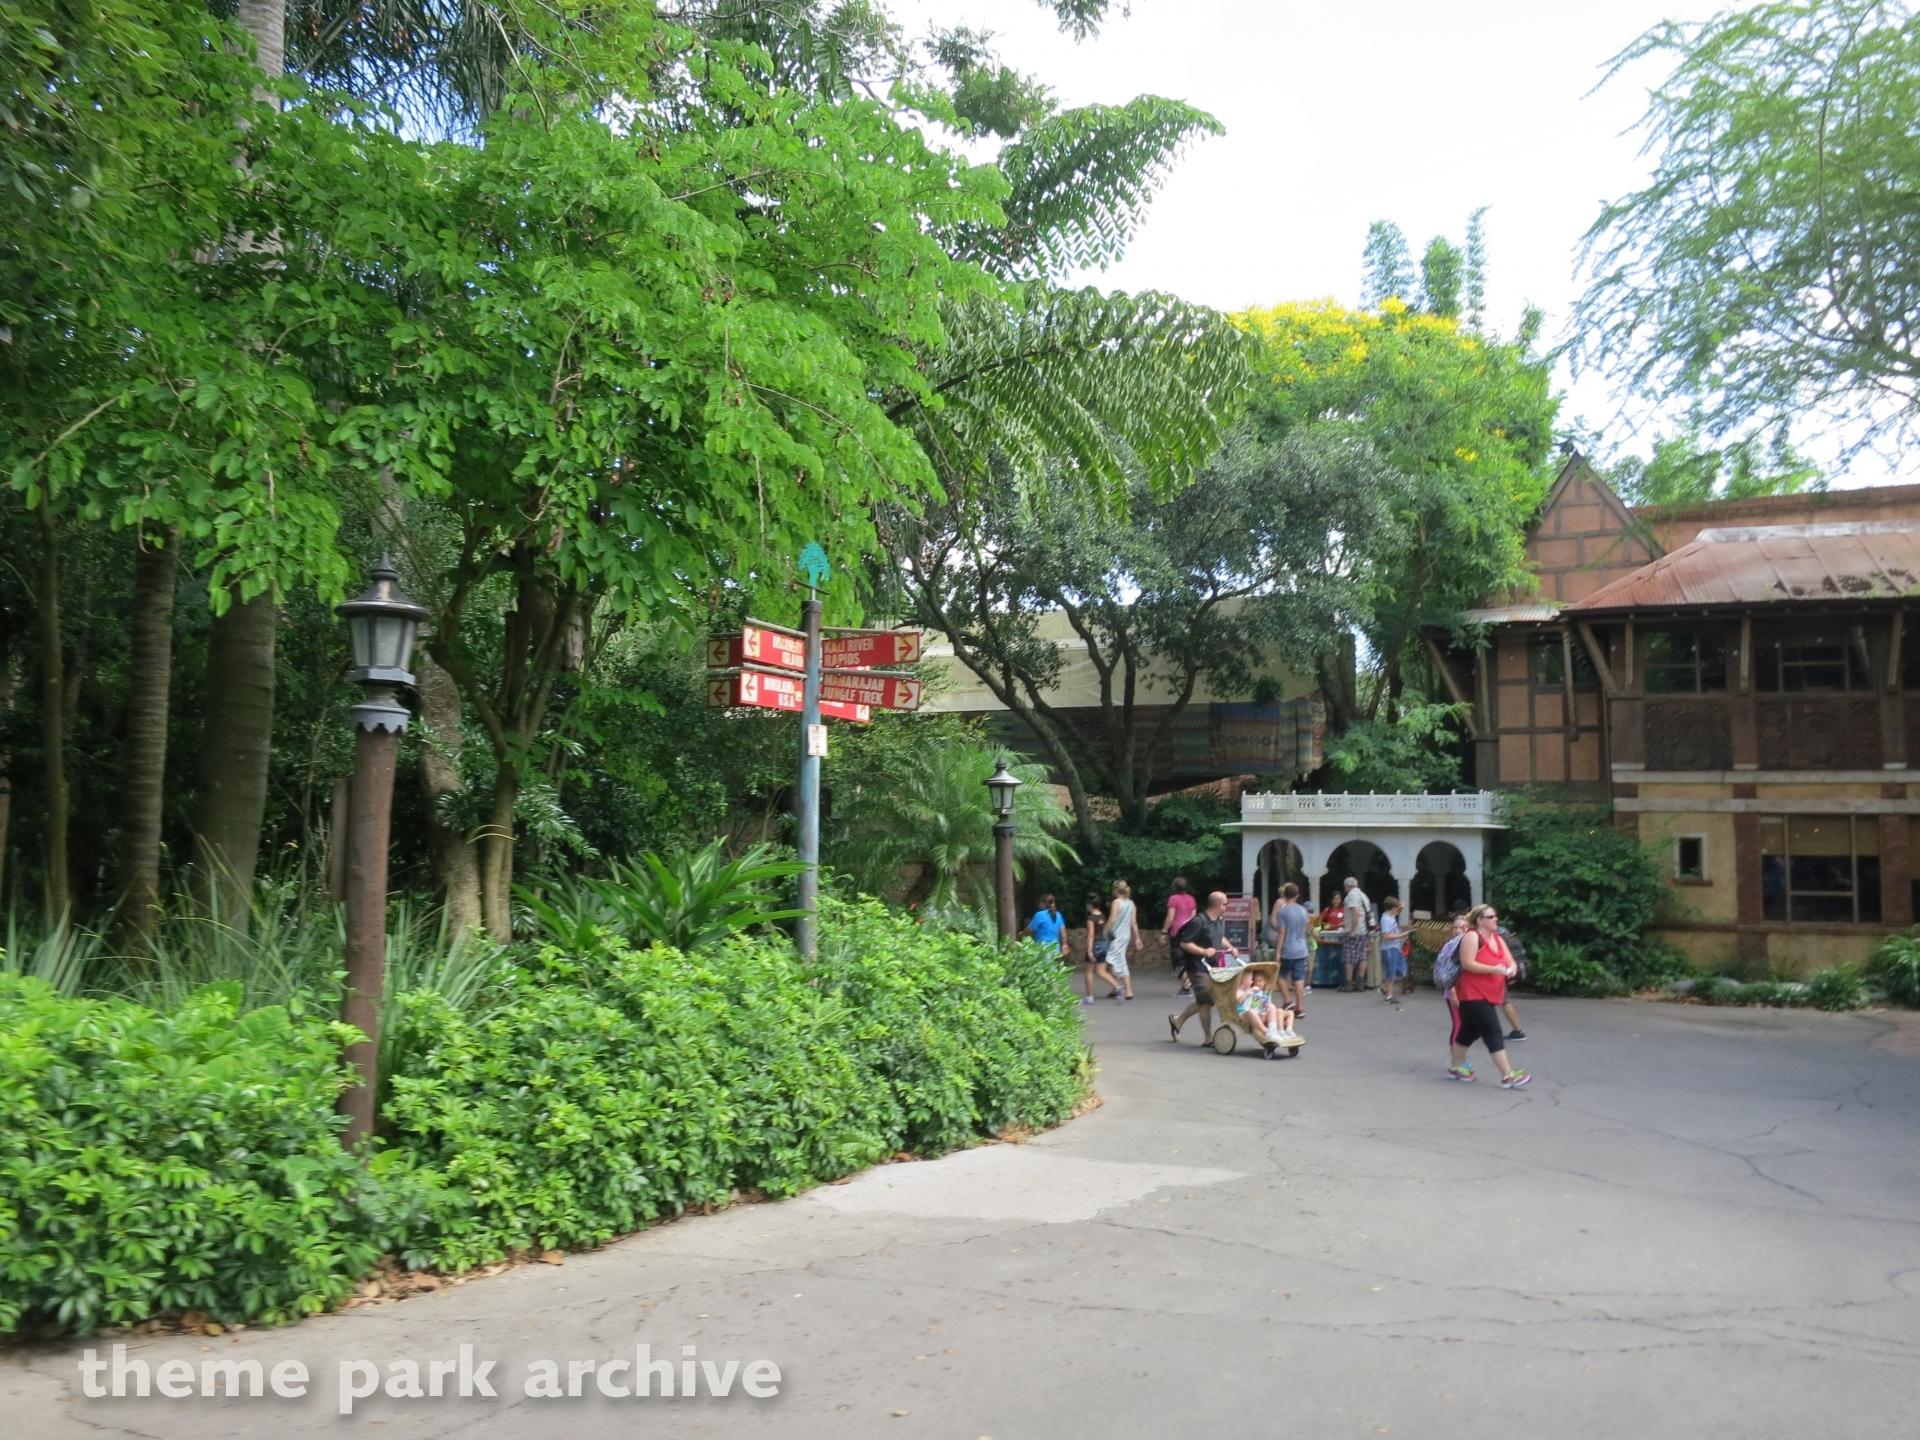 Asia at Disney's Animal Kingdom